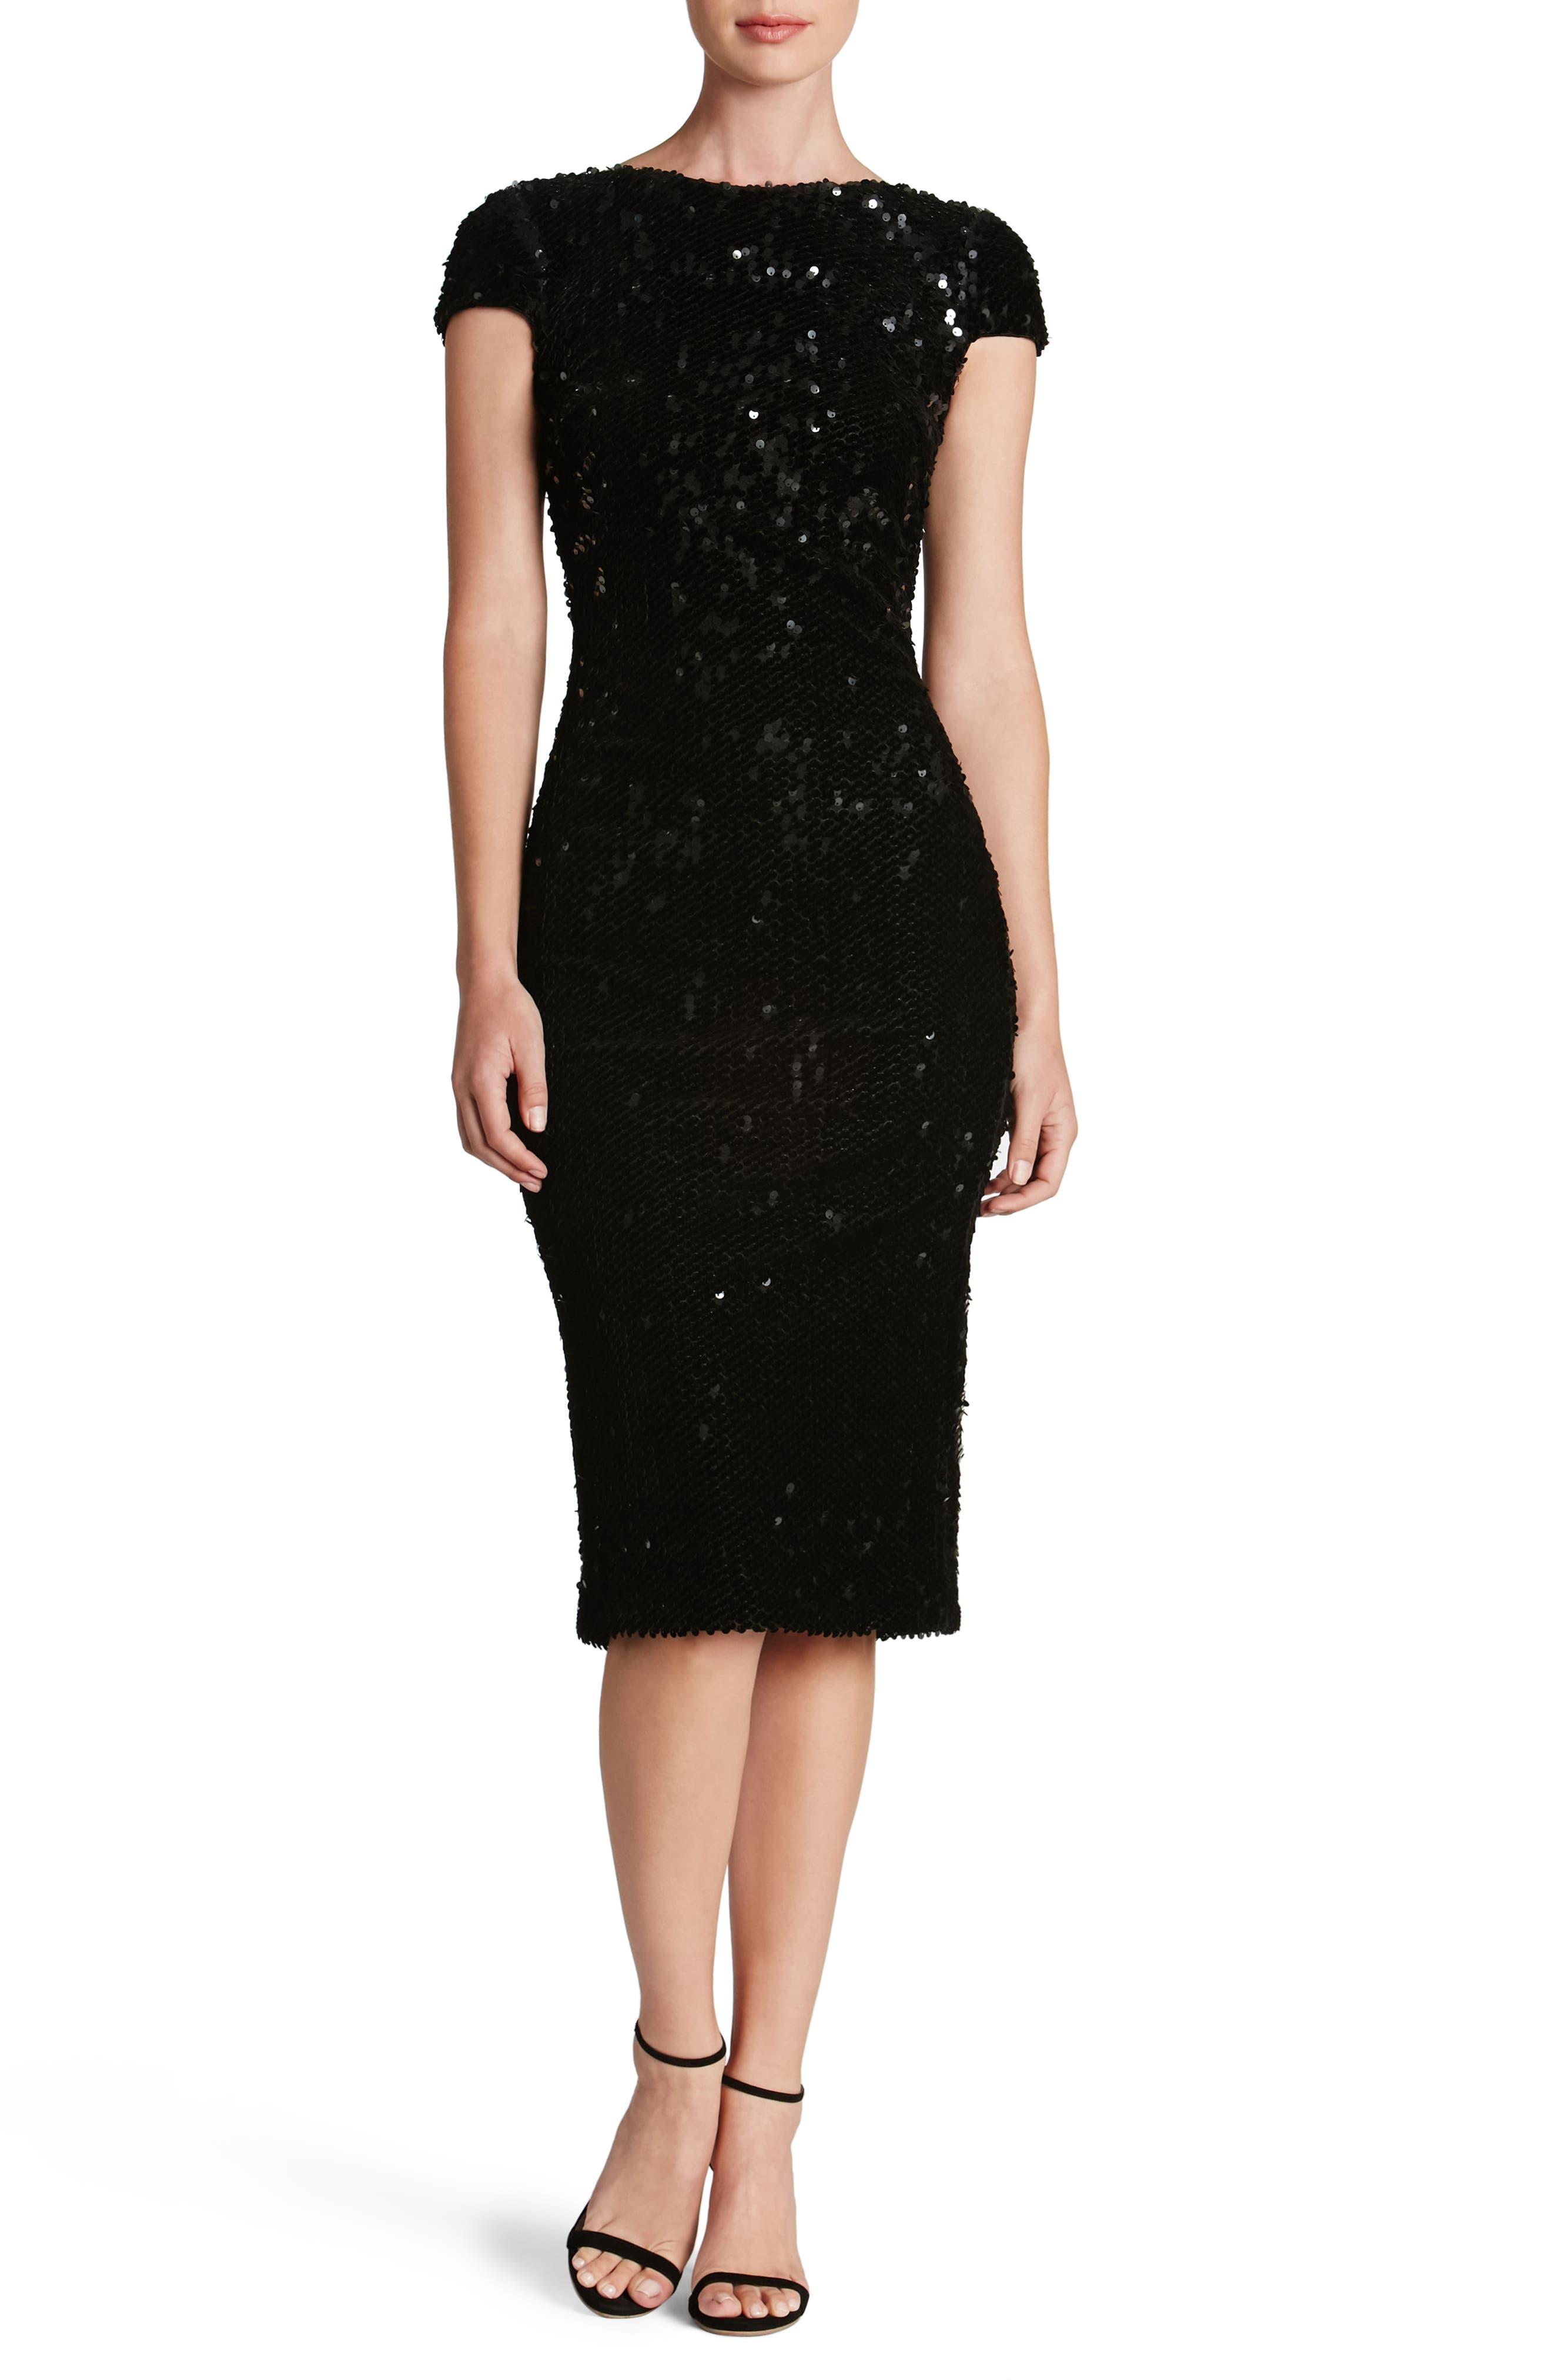 Main Image - Dress the Population Marcella Sequin Body-Con Dress